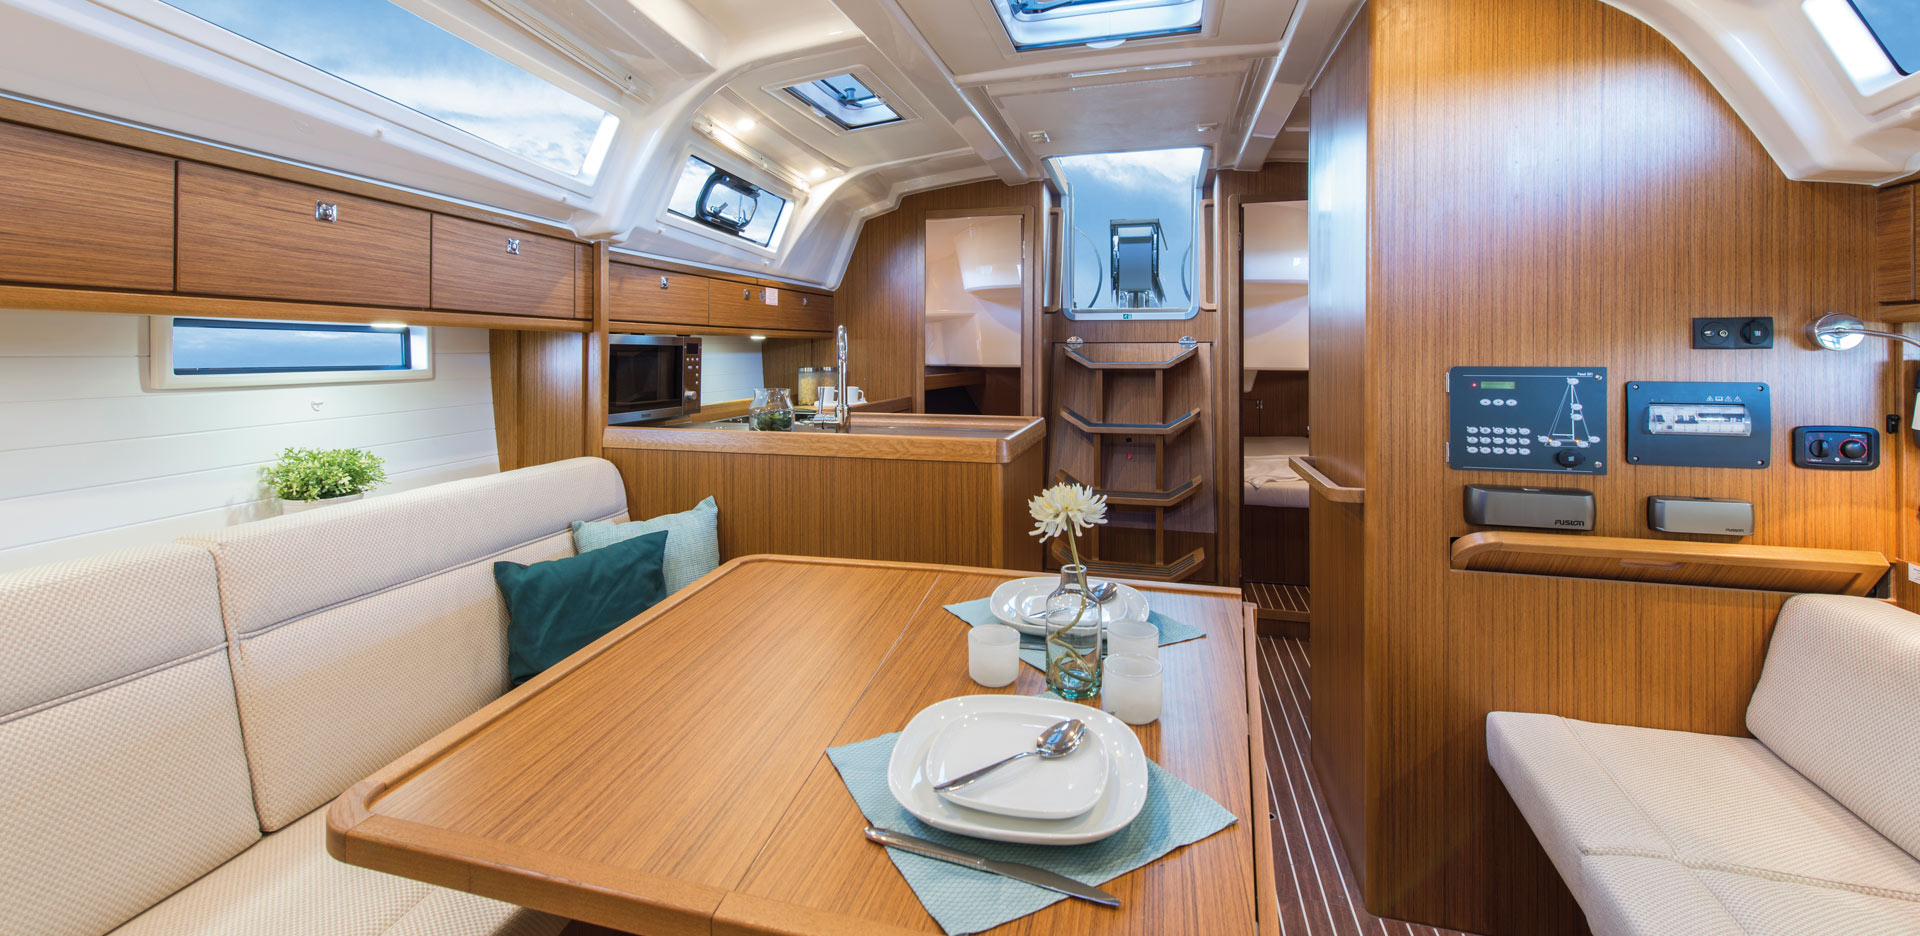 Segelyacht innen  CRUISER 37 | Highlights